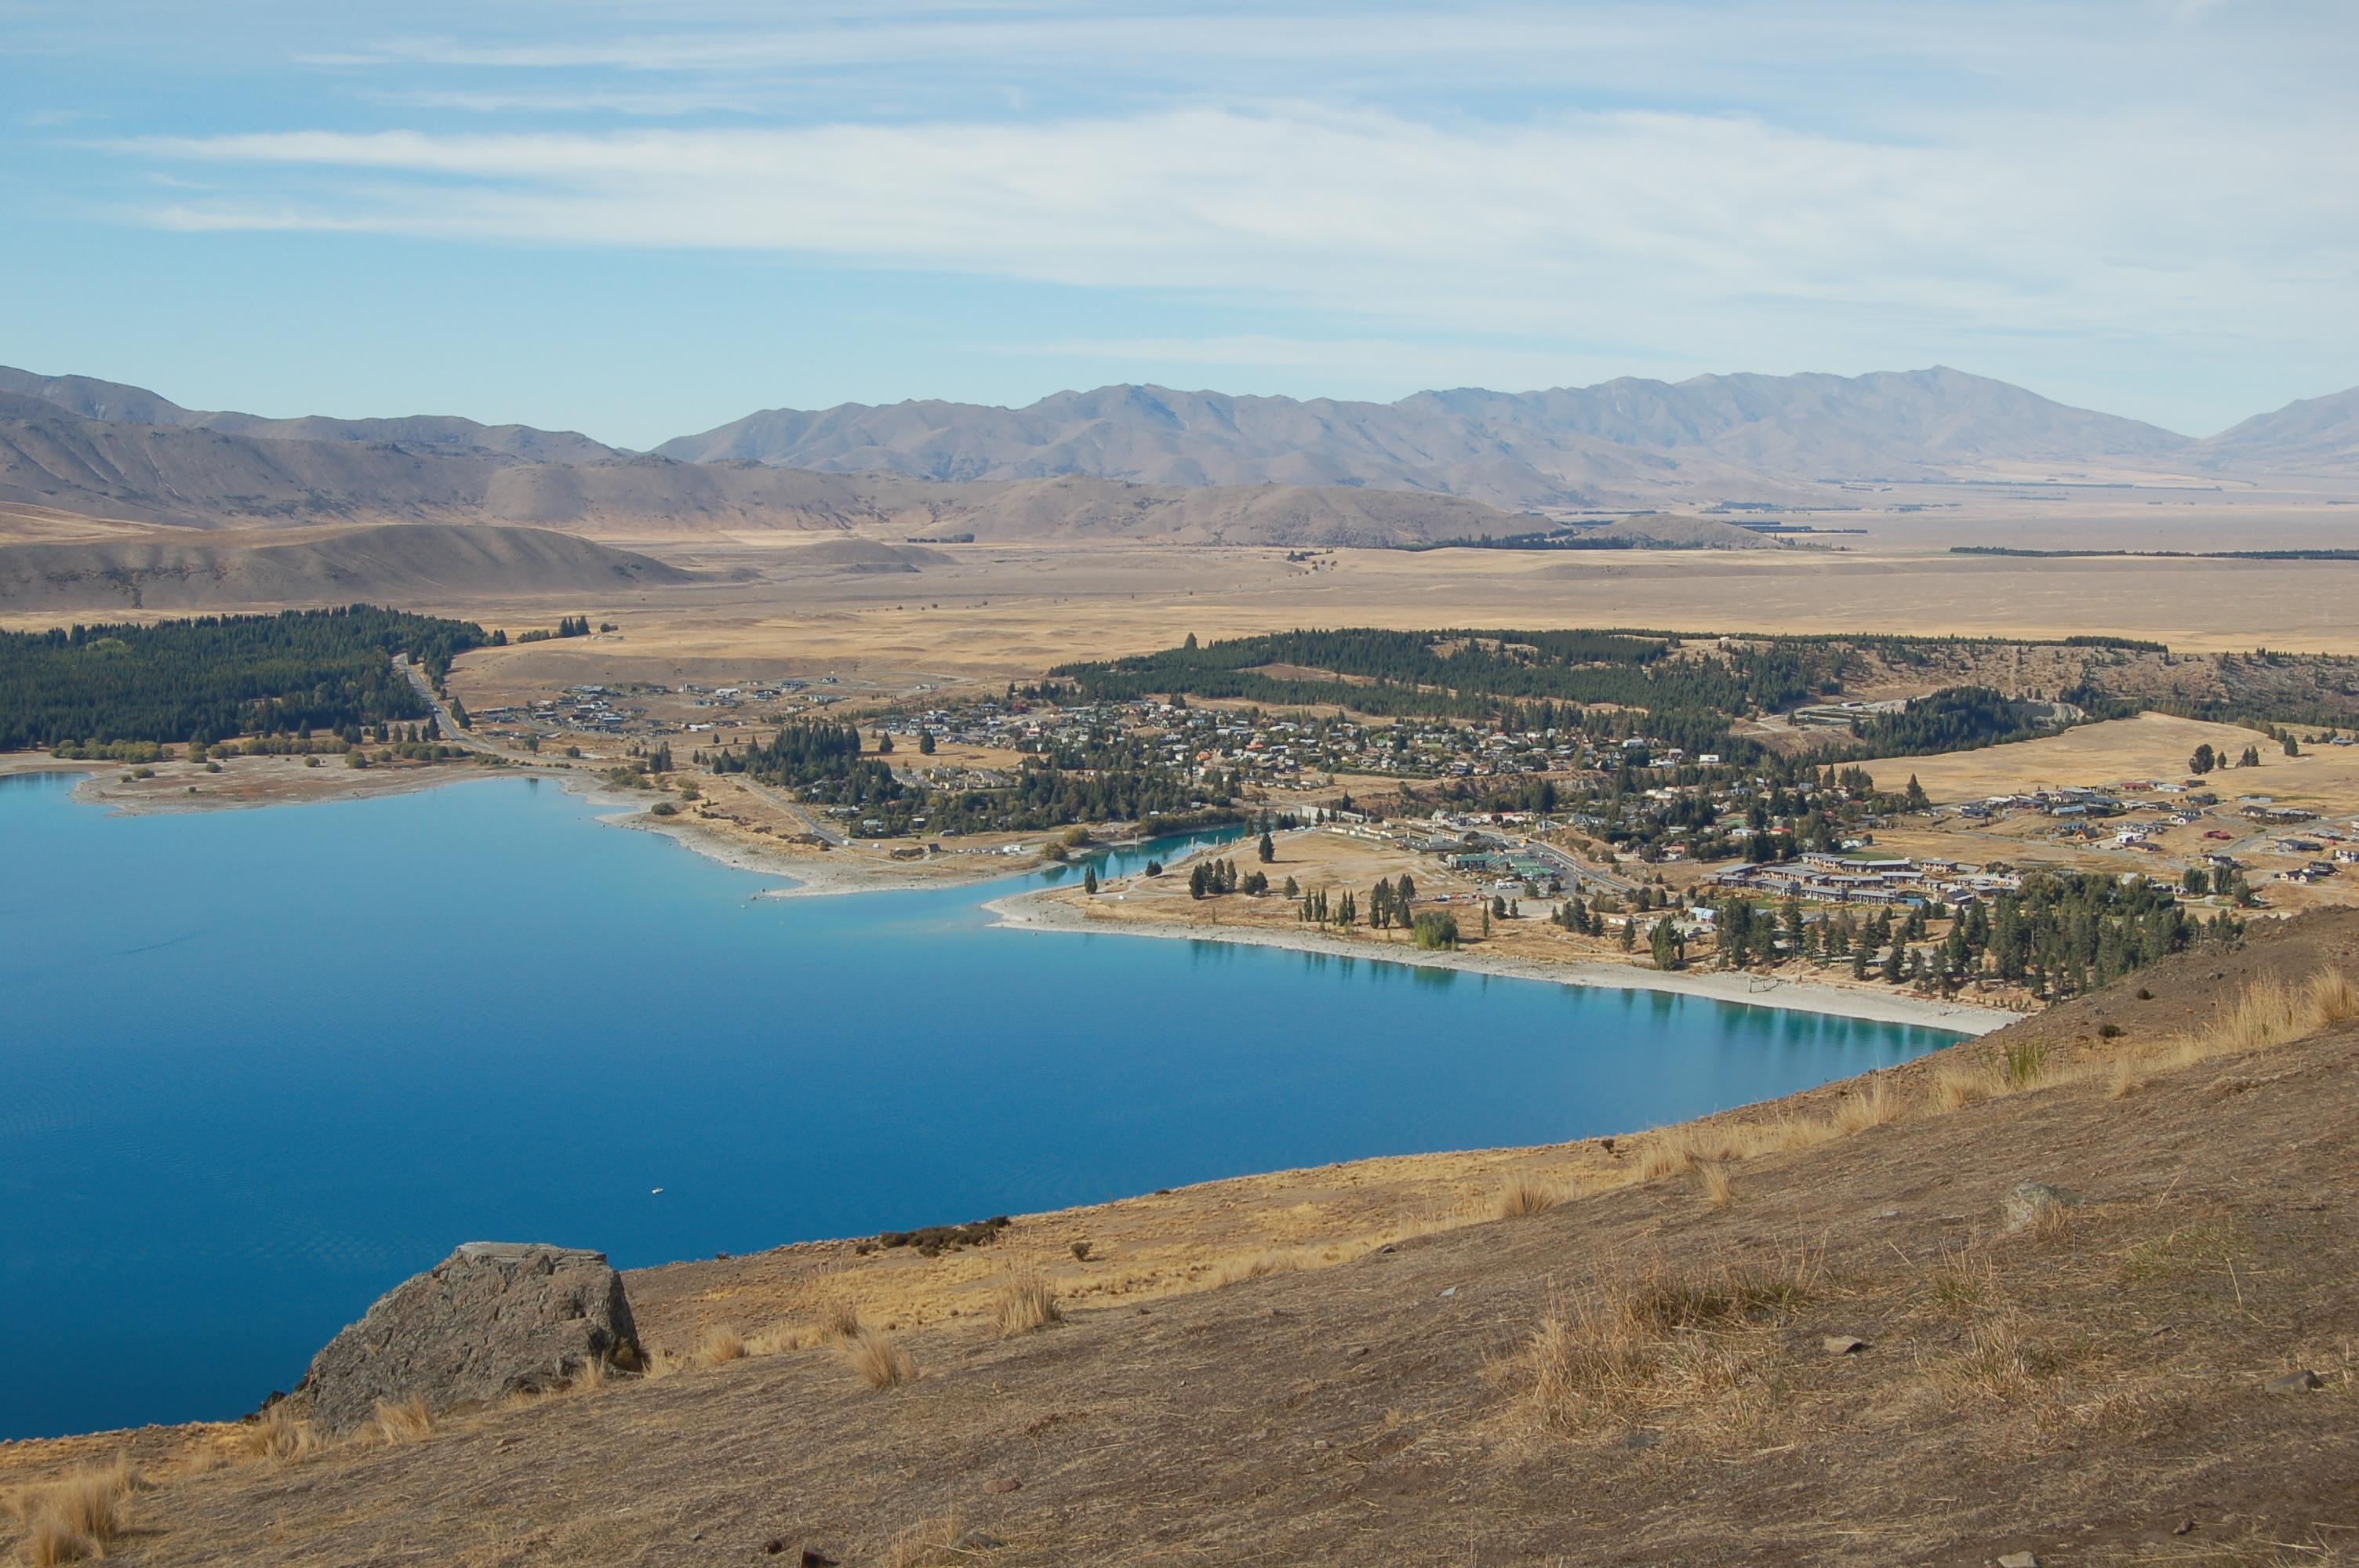 View of Lake Tekapo - New Zealand - Itinerary Planner